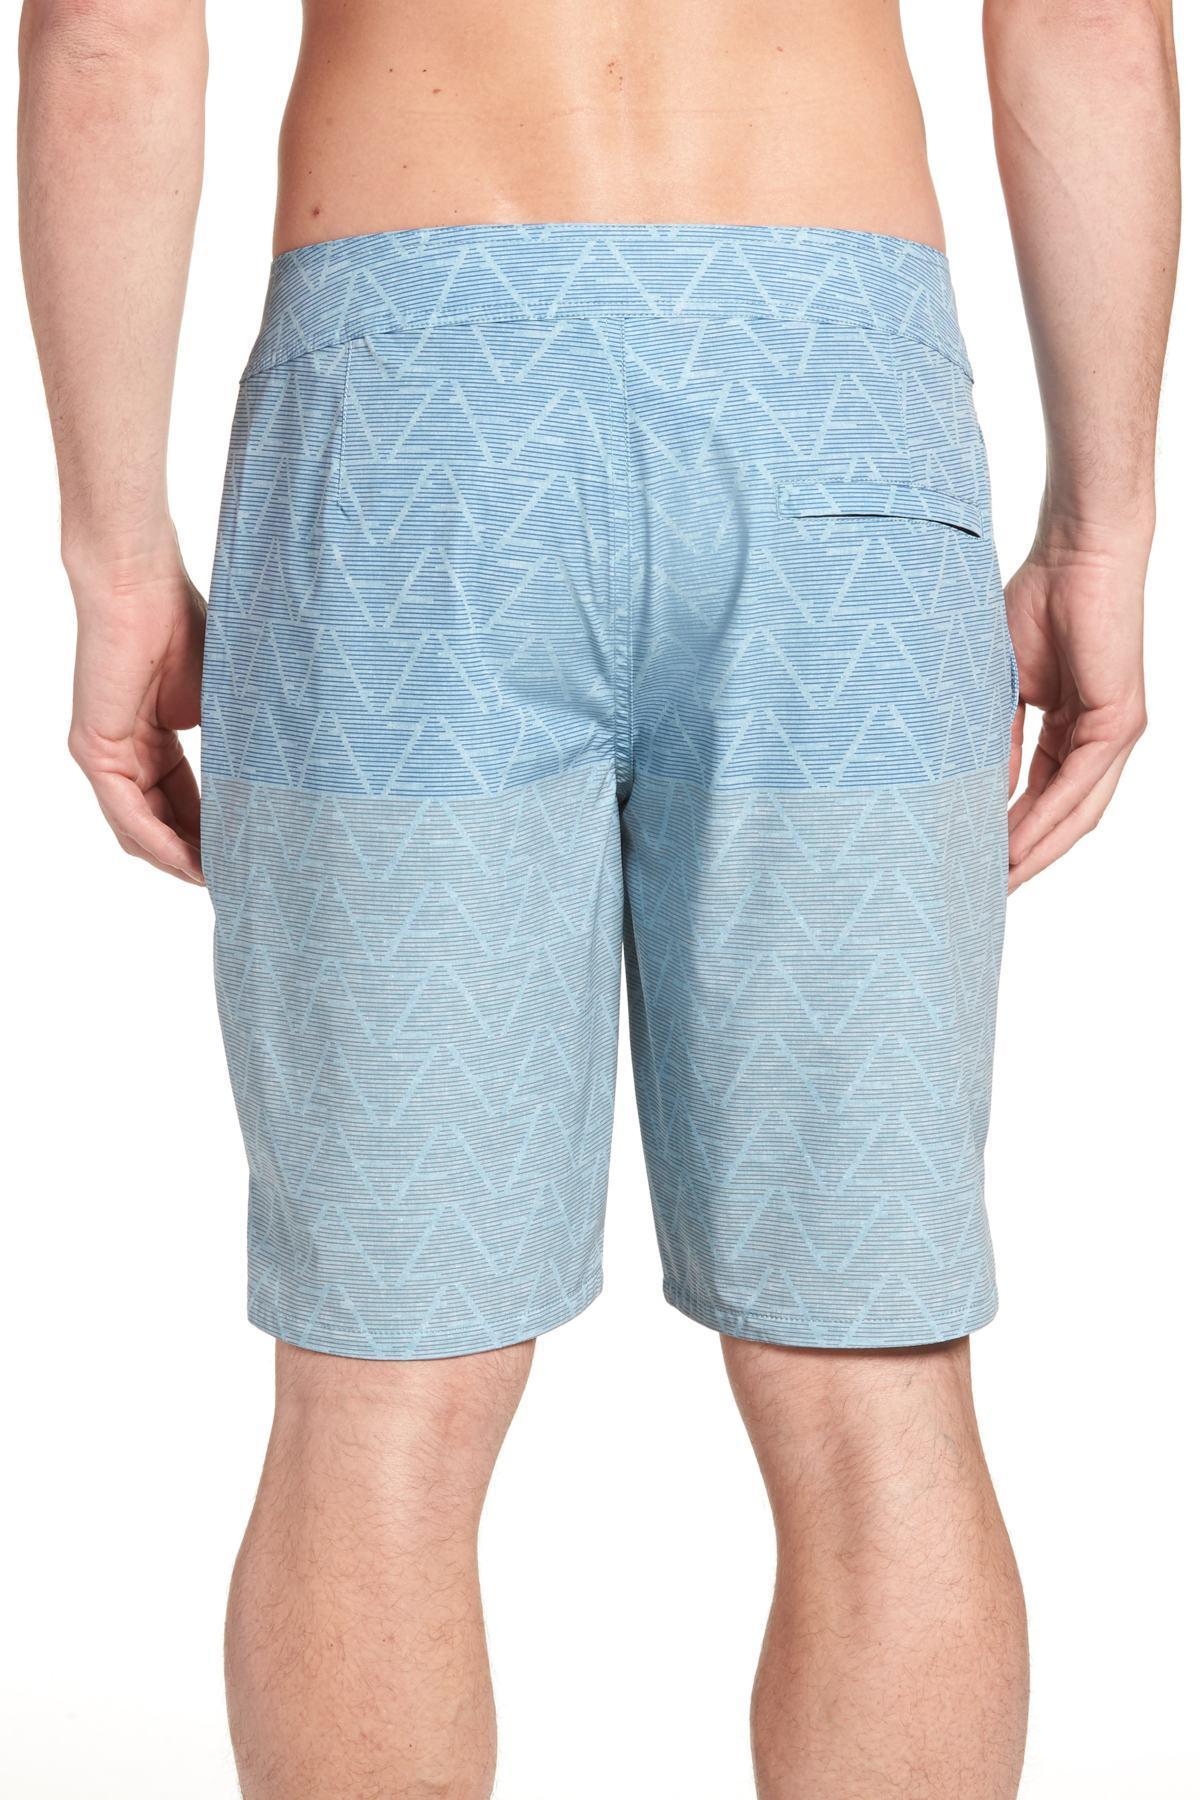 4692115ebd Travis Mathew - Blue Teepees Swim Trunks for Men - Lyst. View fullscreen